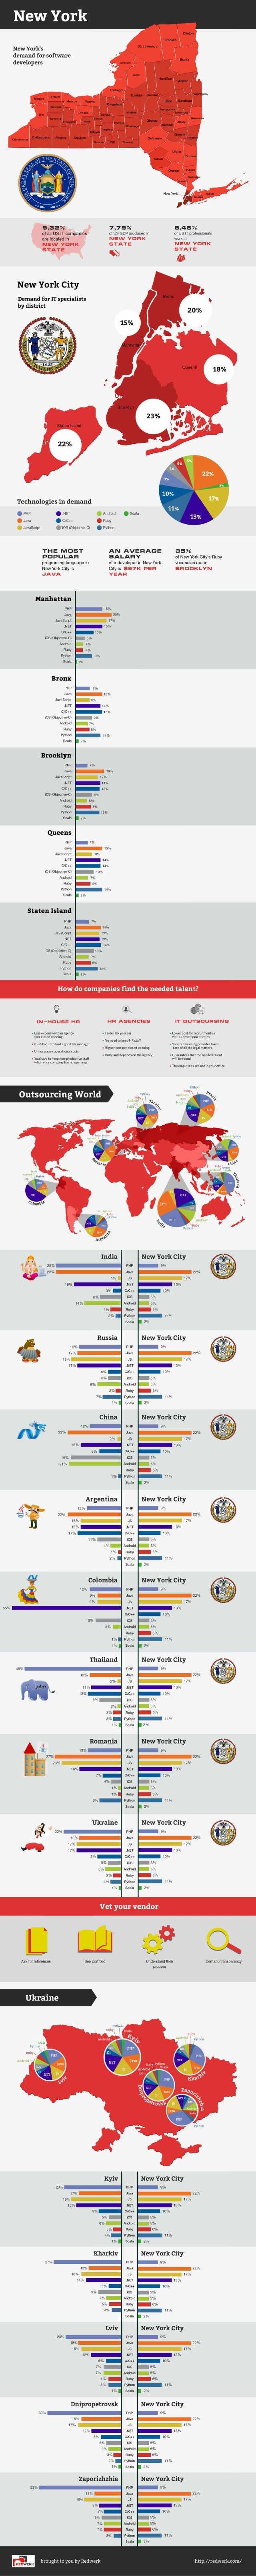 Software Development Technologies in New York